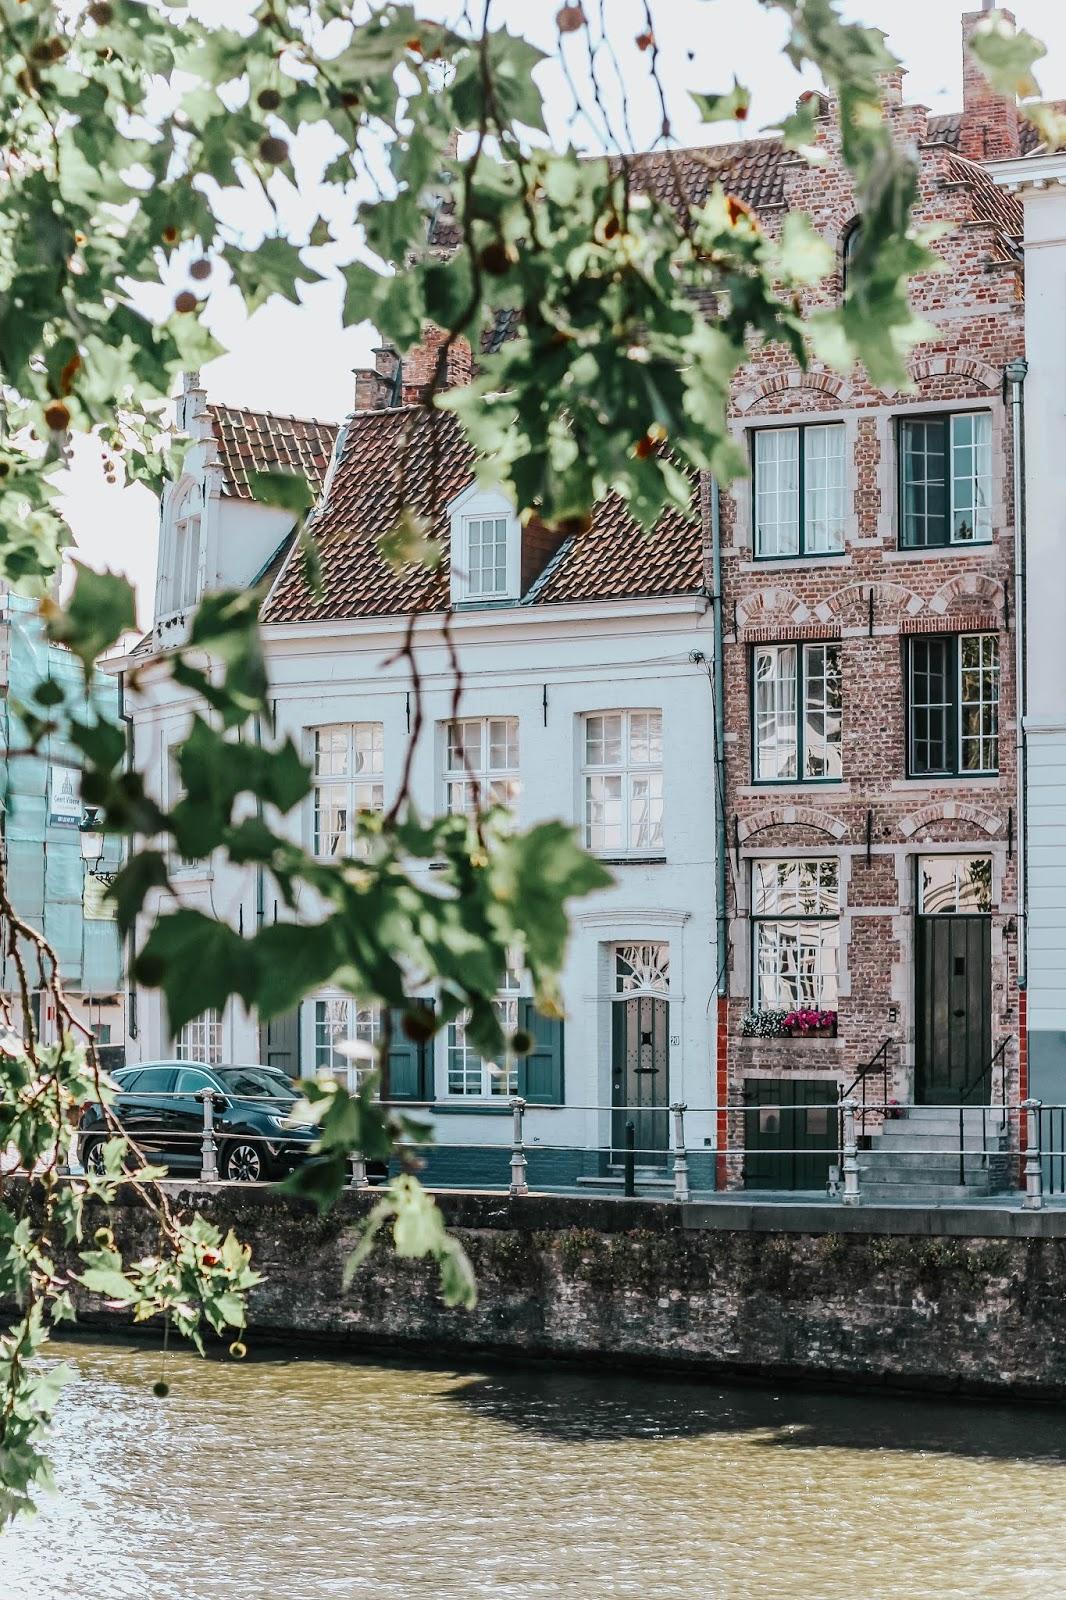 Brugge Belgium Canal Waterside Properties